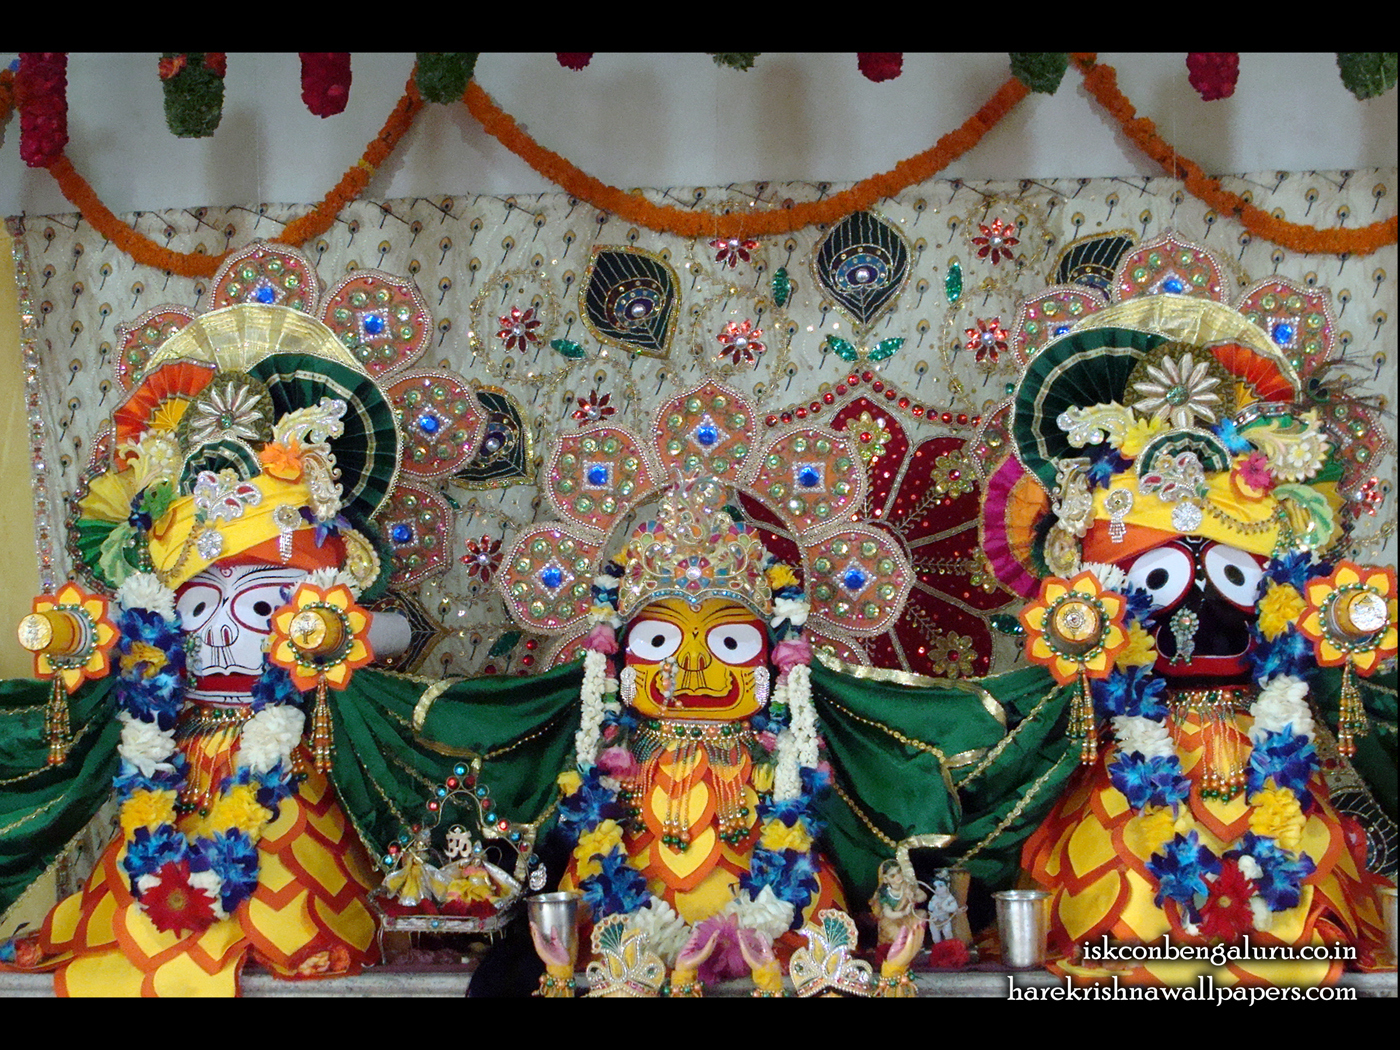 Jagannath Baladeva Subhadra Wallpaper (001) Size 1400x1050 Download